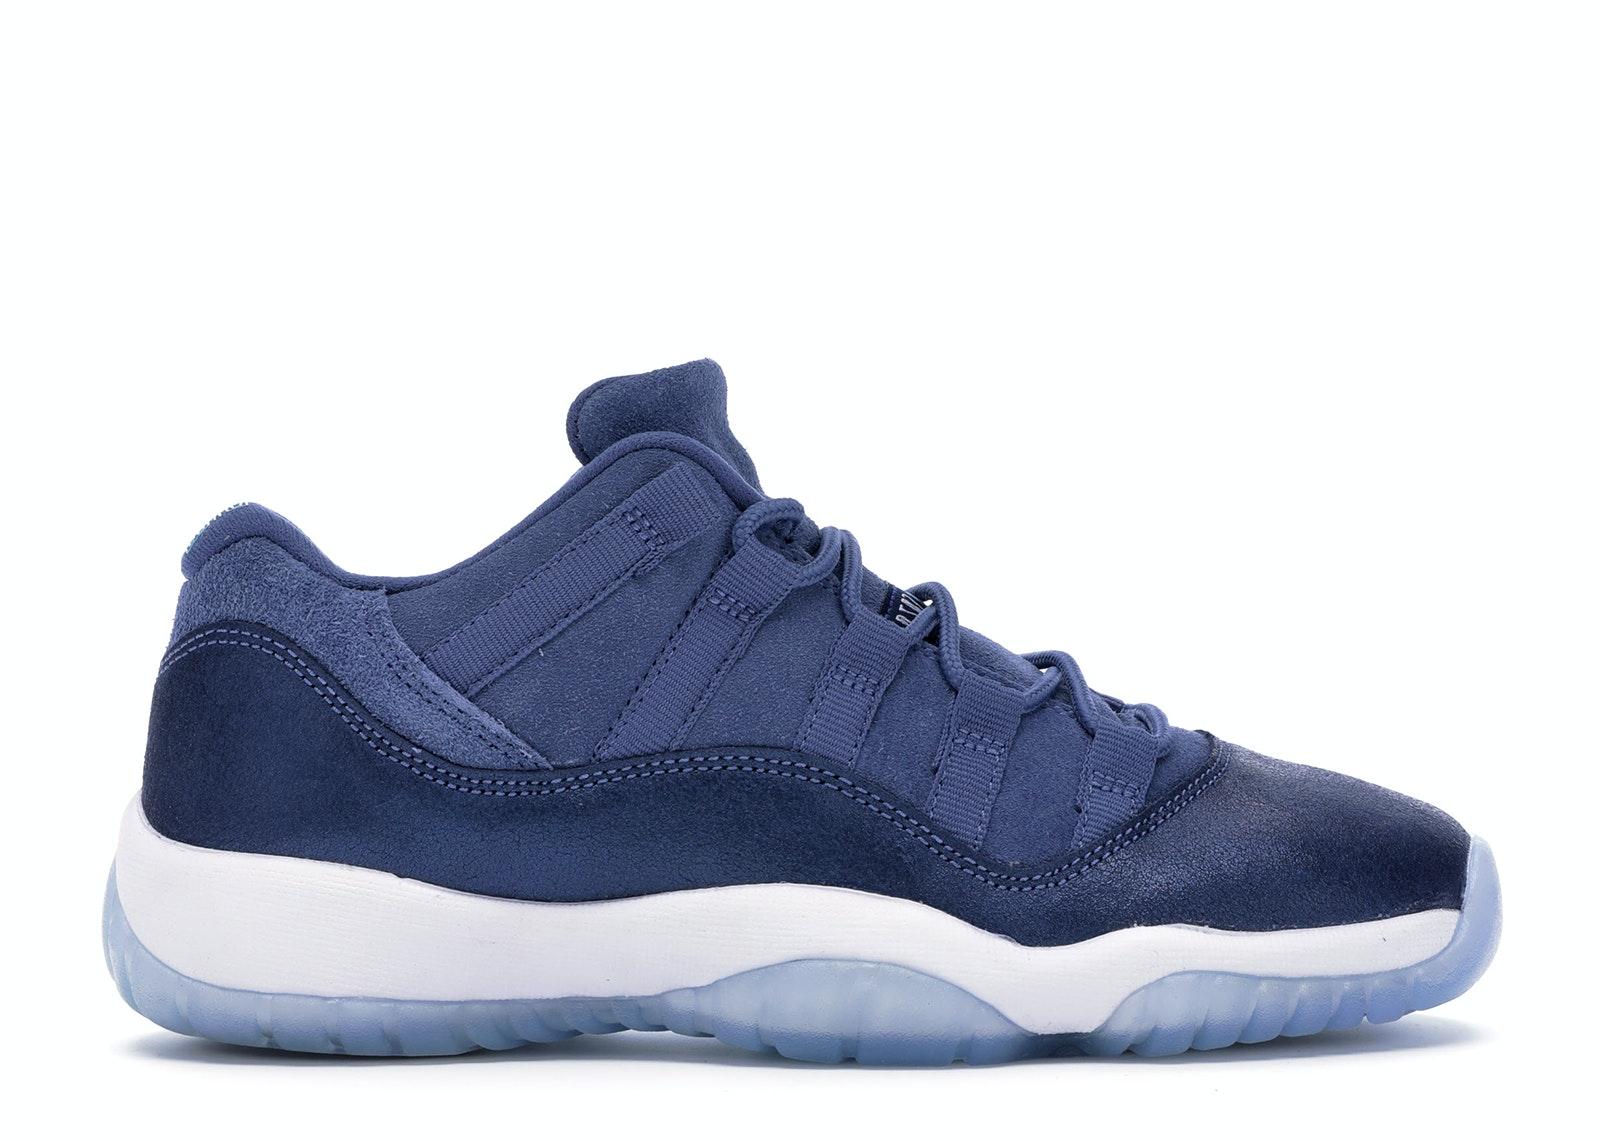 Jordan 11 Retro Low Blue Moon (GS)